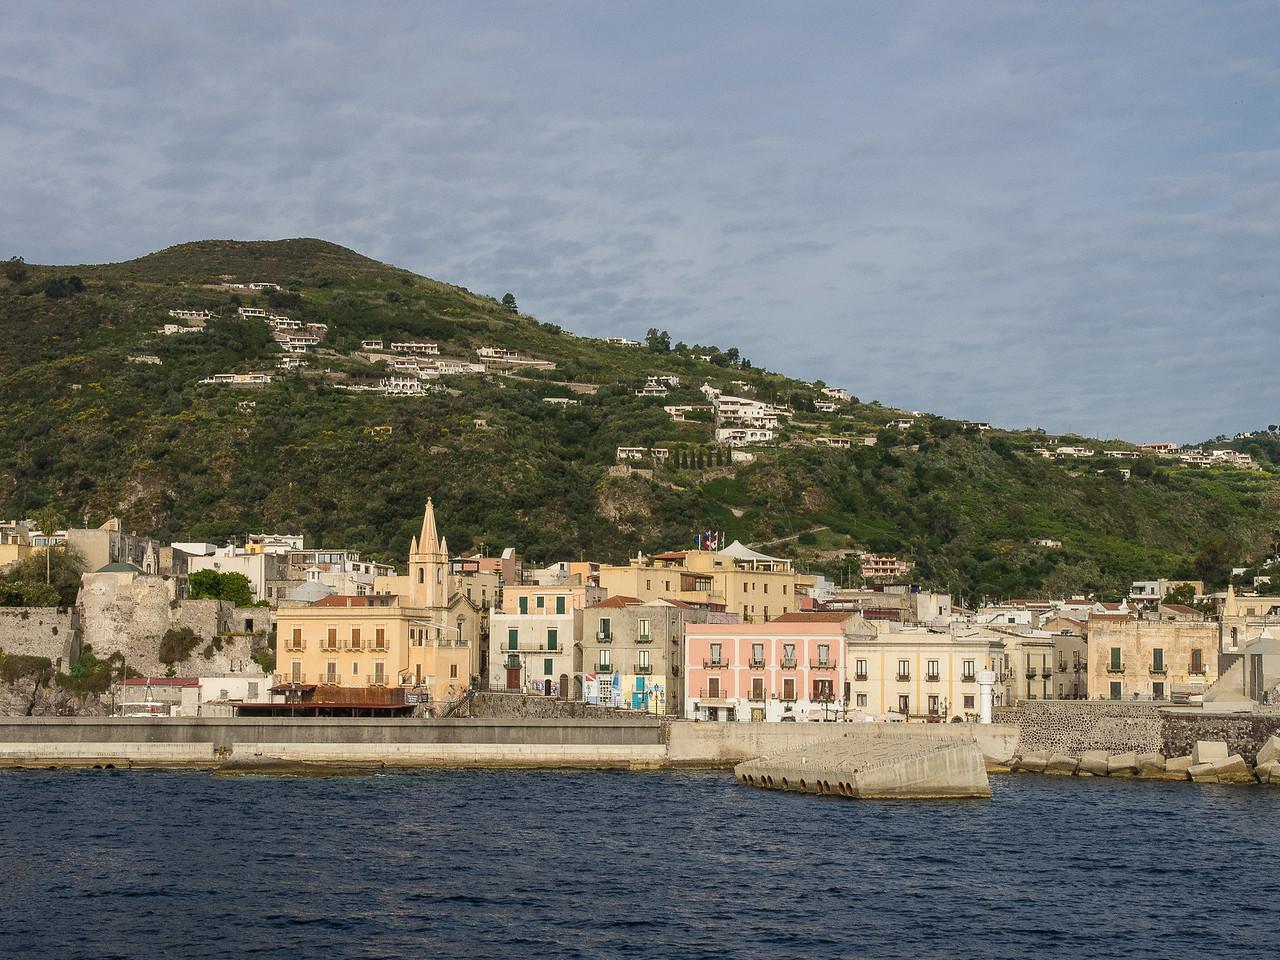 Lipari main harbor and town